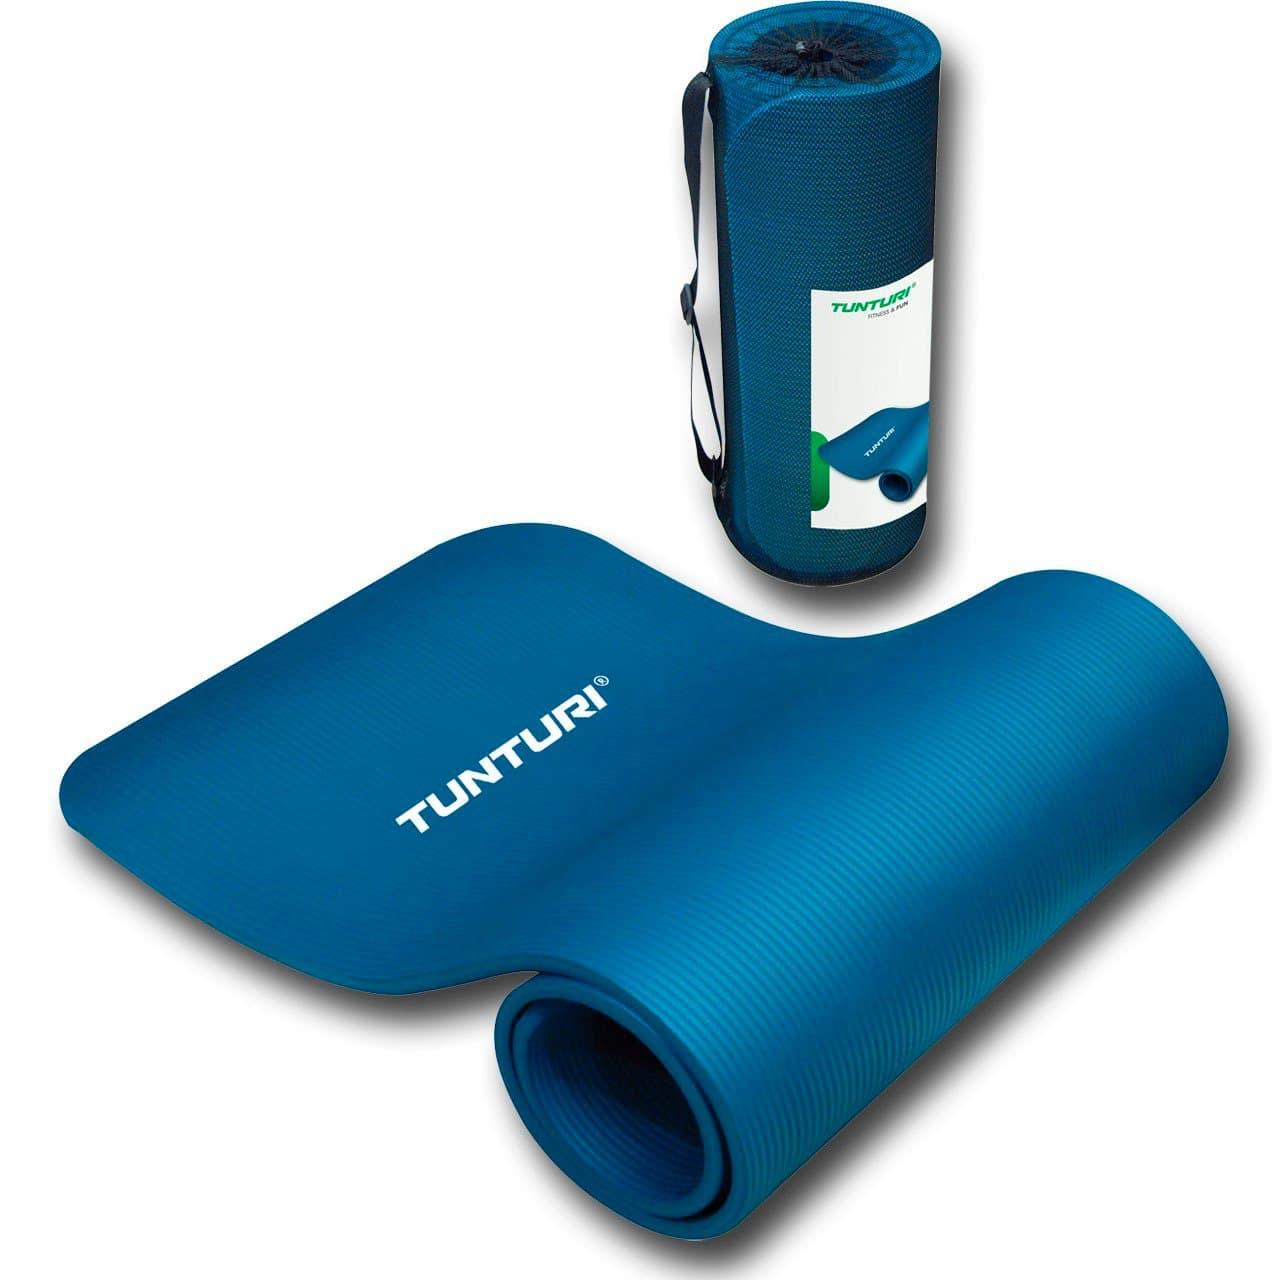 Tunturi Tappetino fitness blu